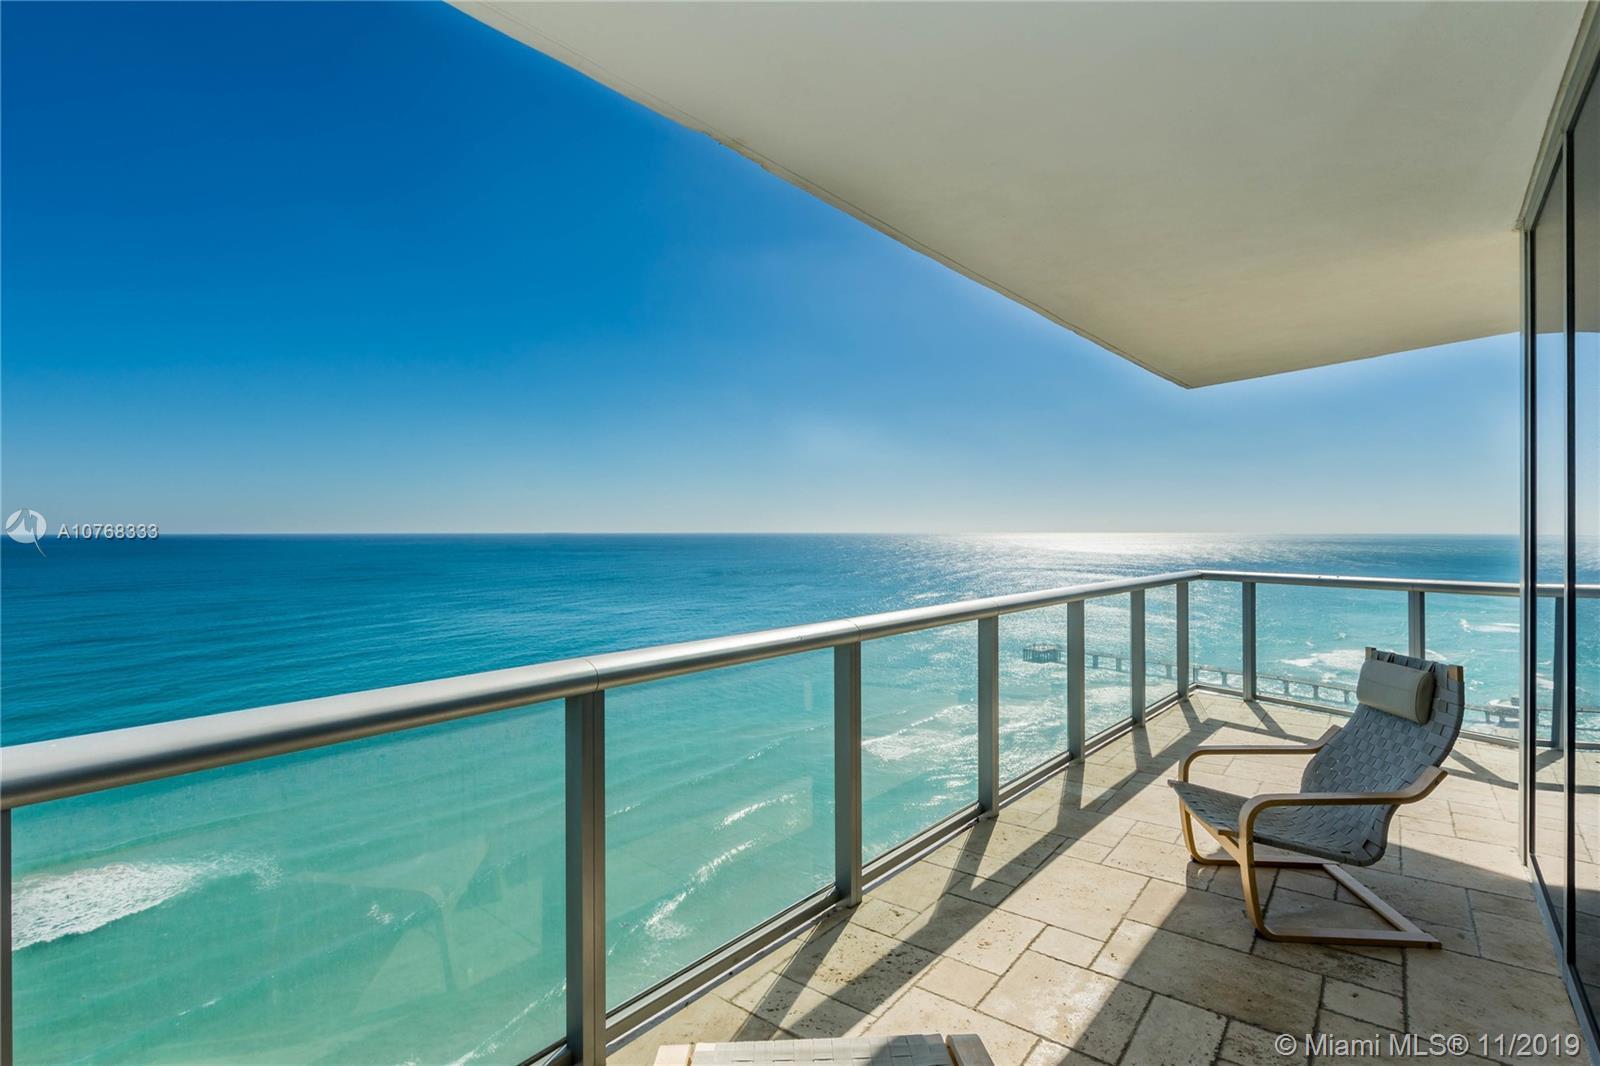 17001 COLLINS AV, 2401 - Sunny Isles Beach, Florida